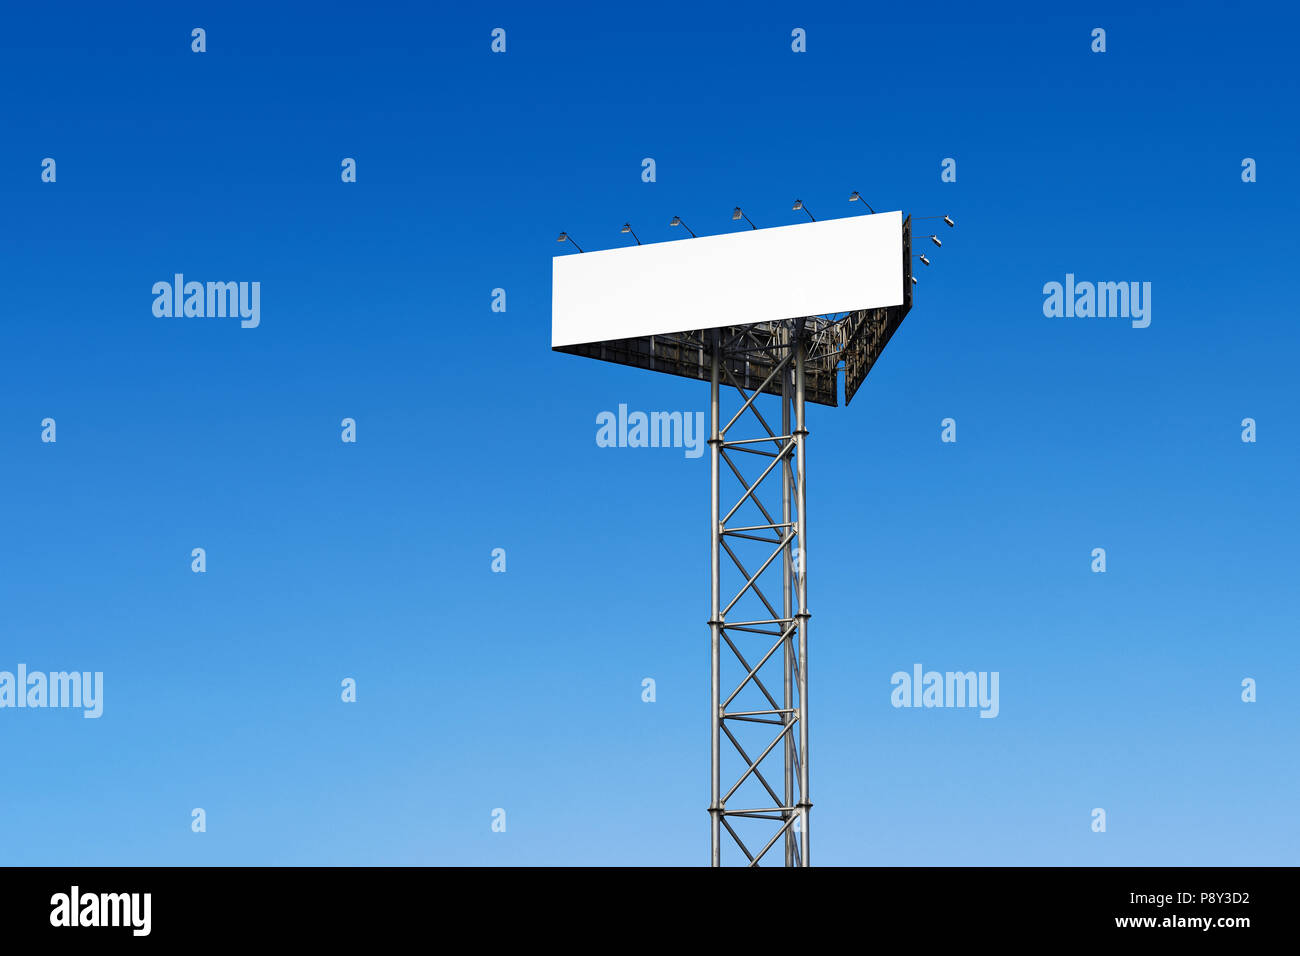 Blank Billboard against a blue sky - Stock Image